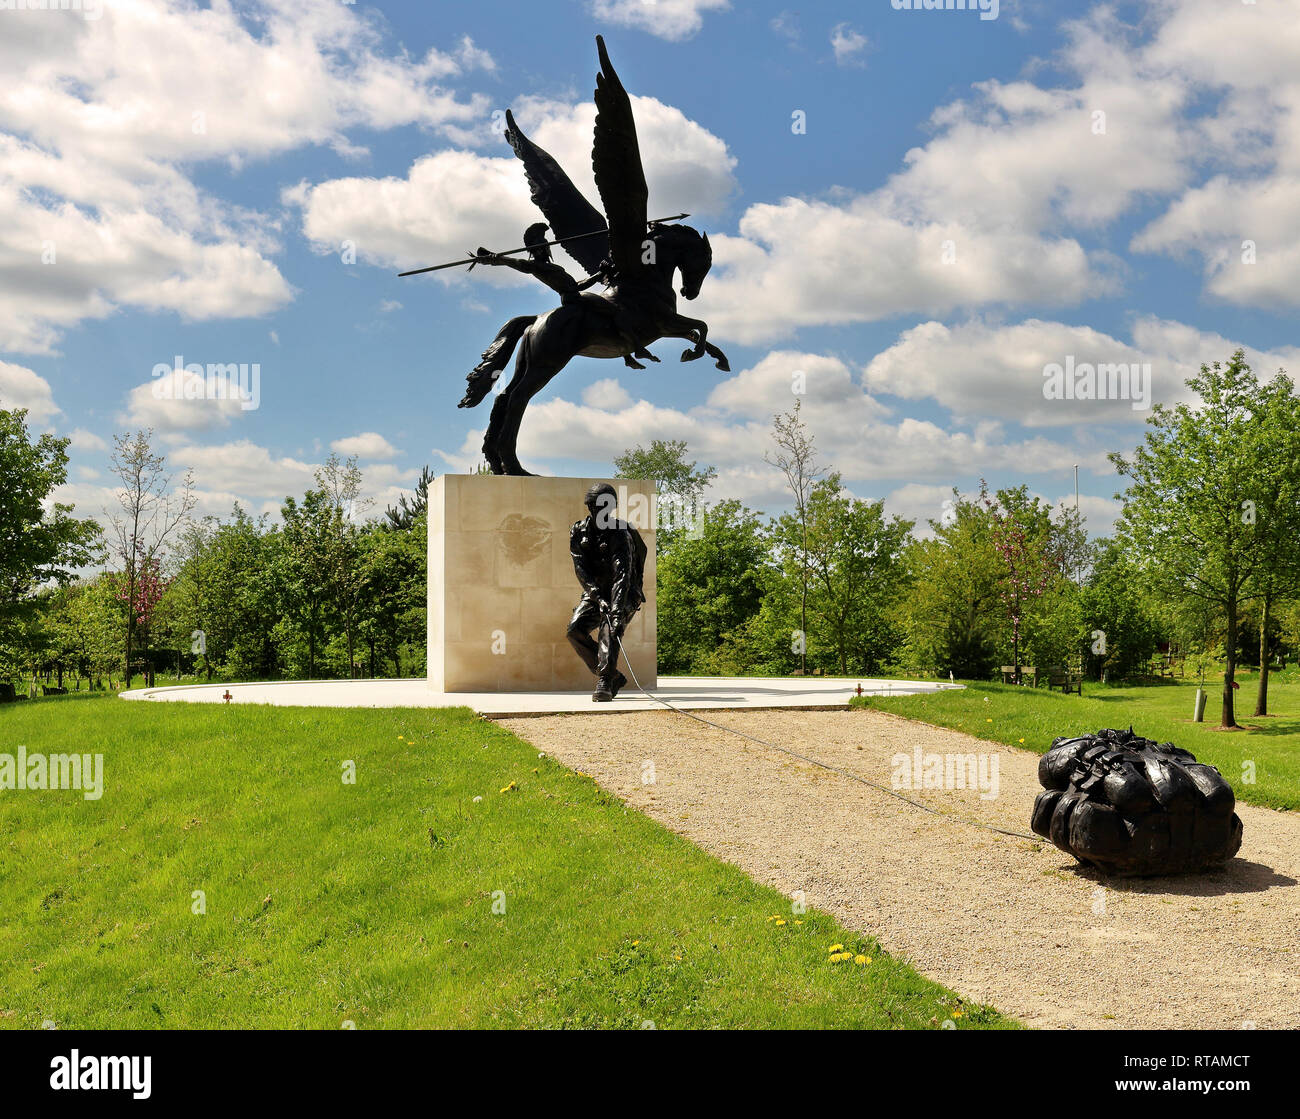 Parachute Regiment Memorial at the National Memorial Arboretum Staffordshire, England - Stock Image